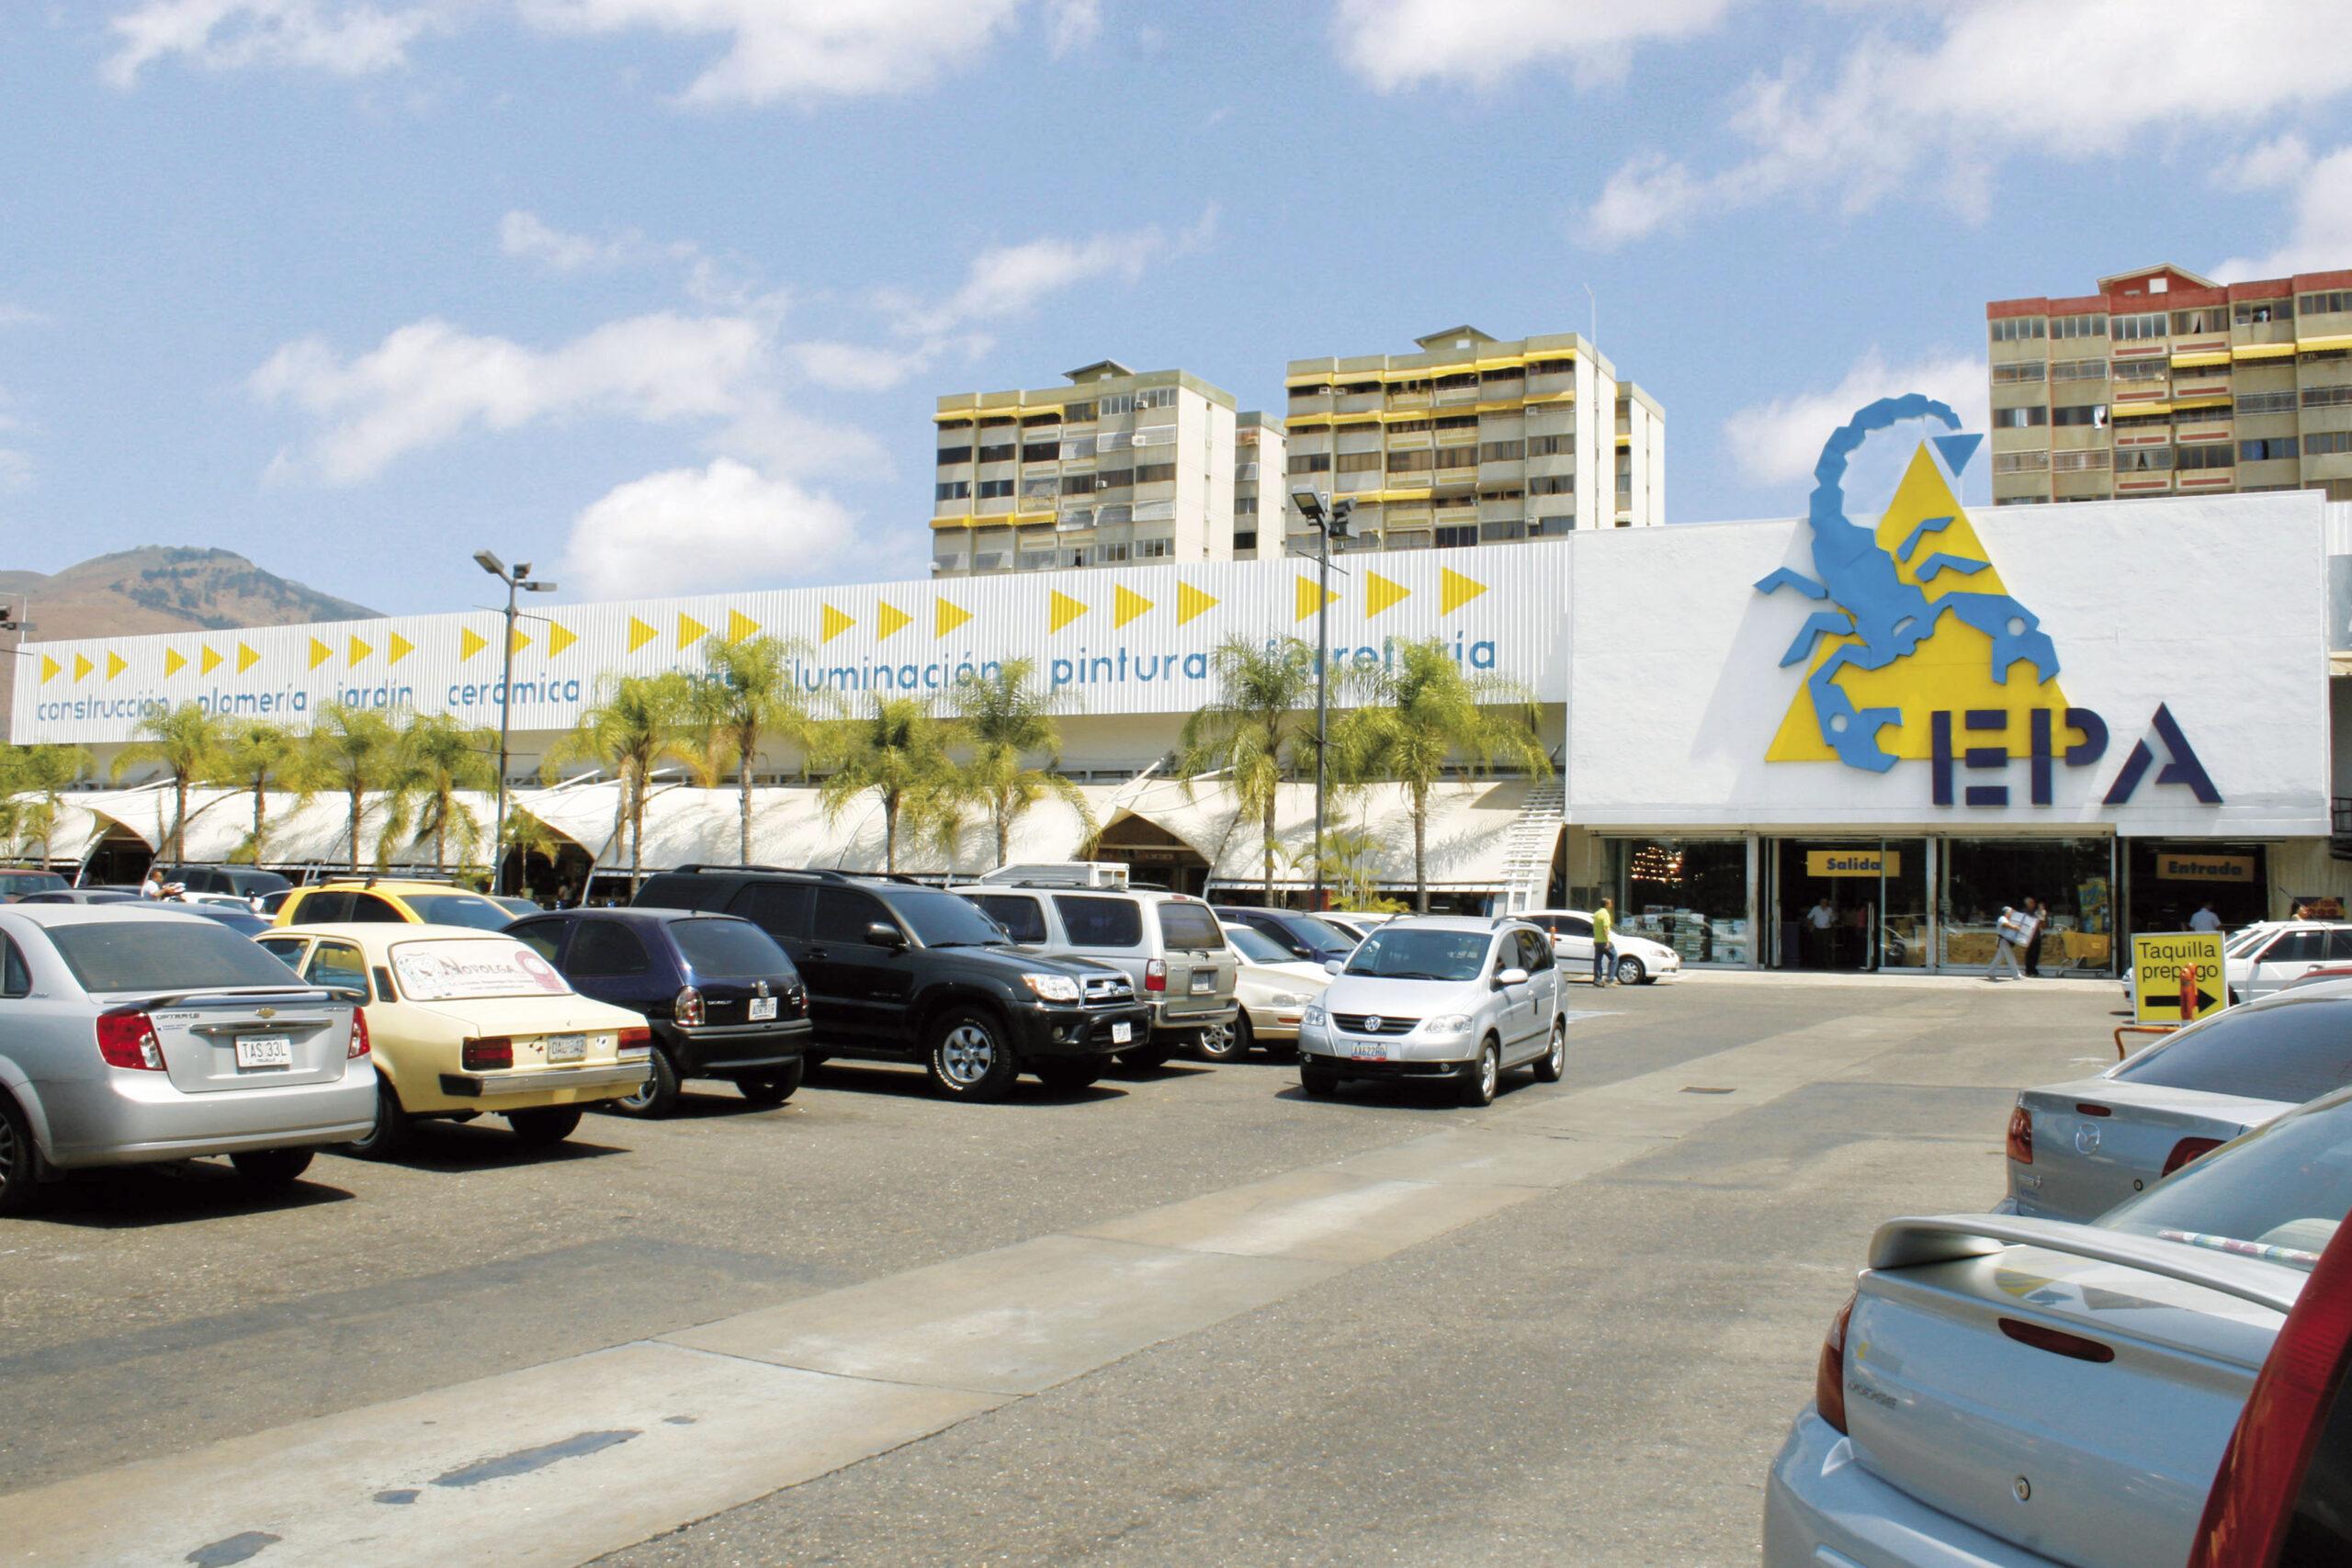 Red de tiendas EPA habilitadas como centros de acopio